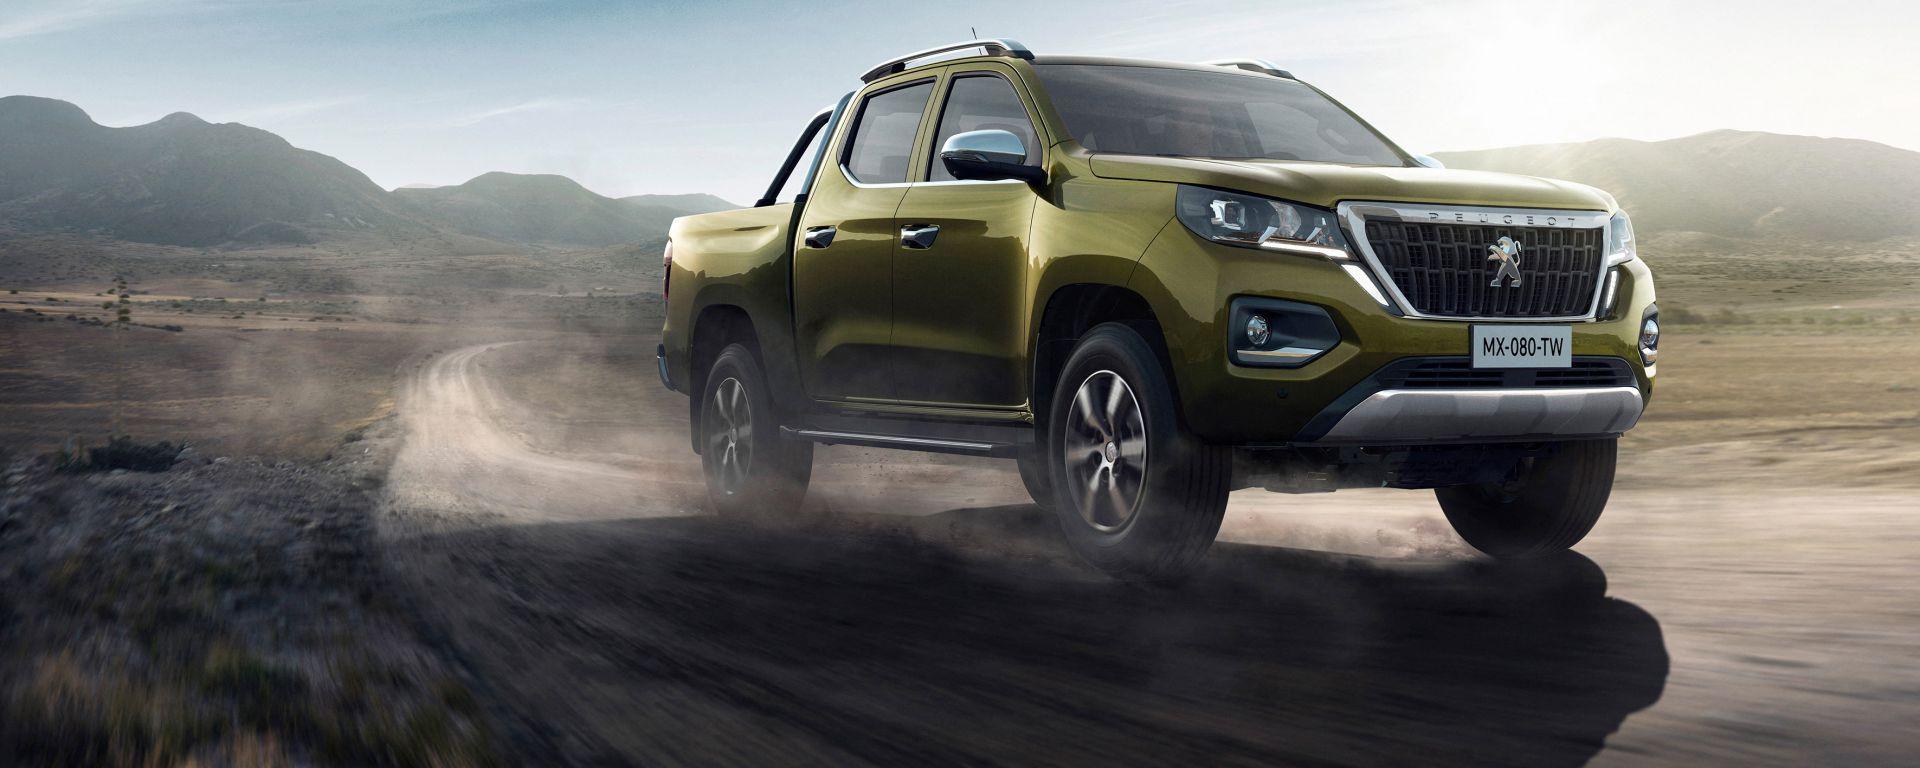 Peugeot Landtrek, il primo pick-up del Leone